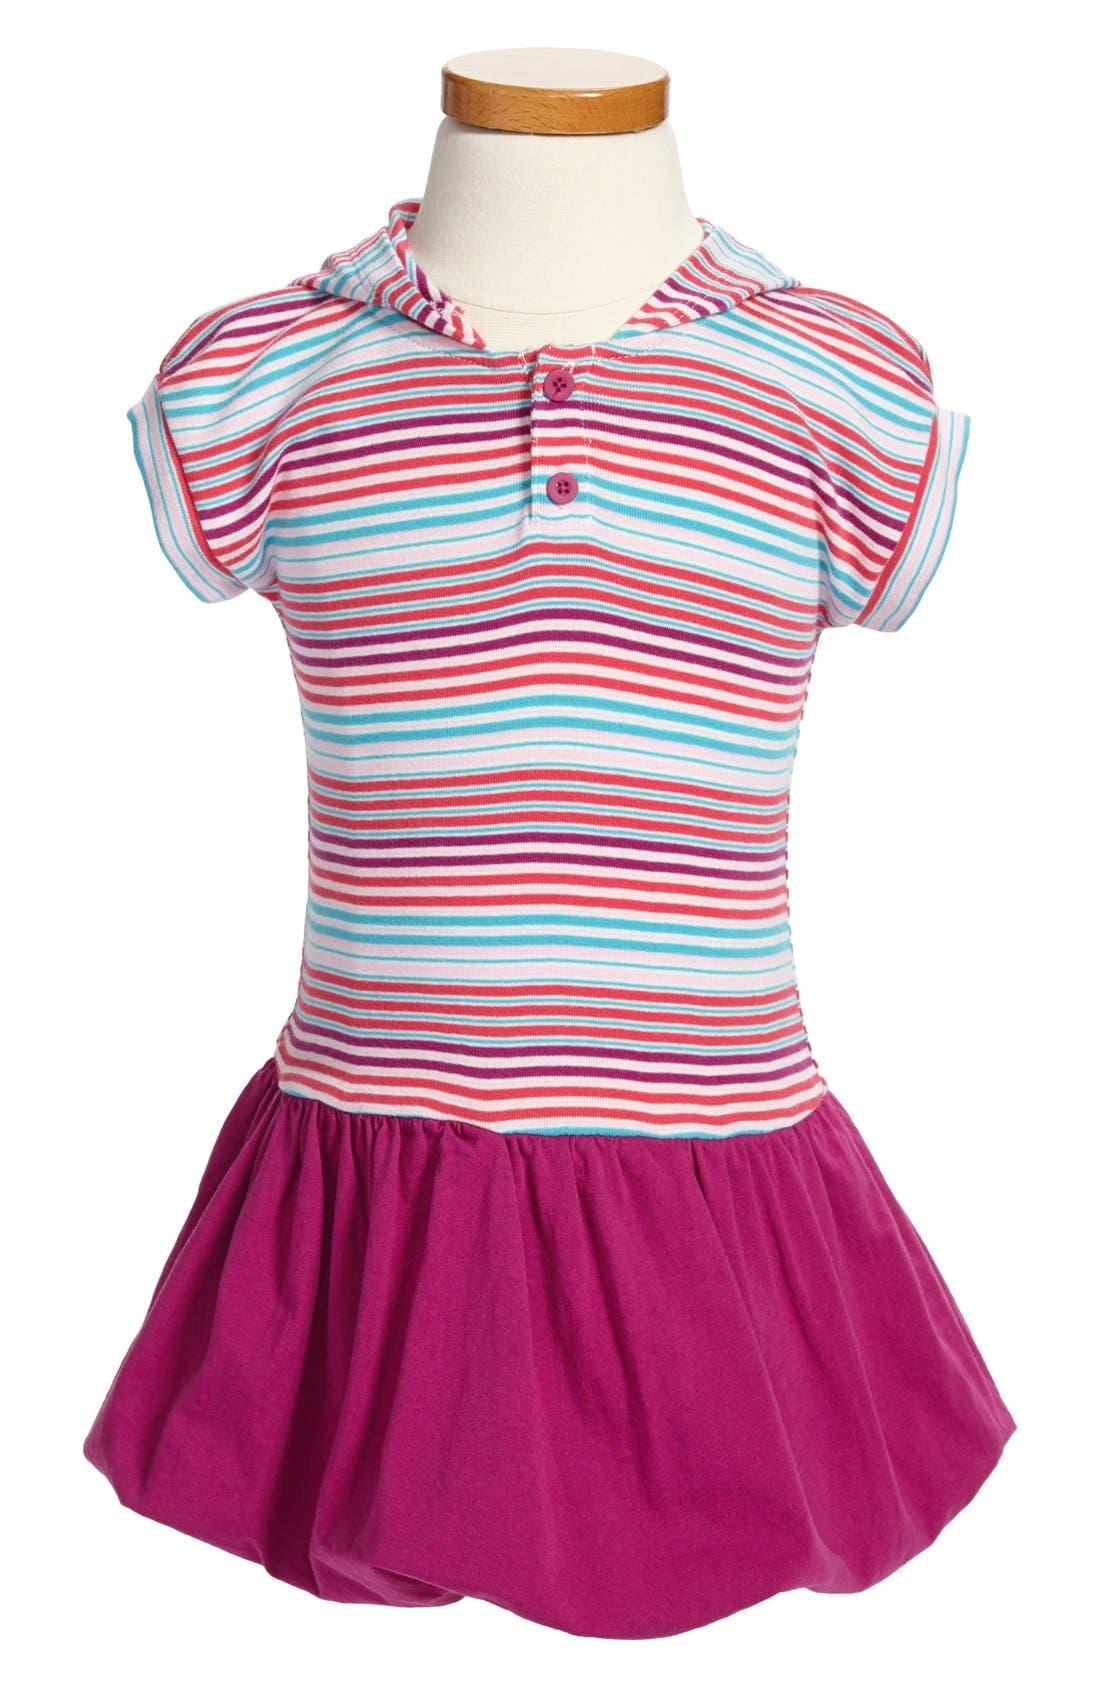 Main Image - Tea Collection 'Market Stripe' Bubble Dress (Toddler Girls)